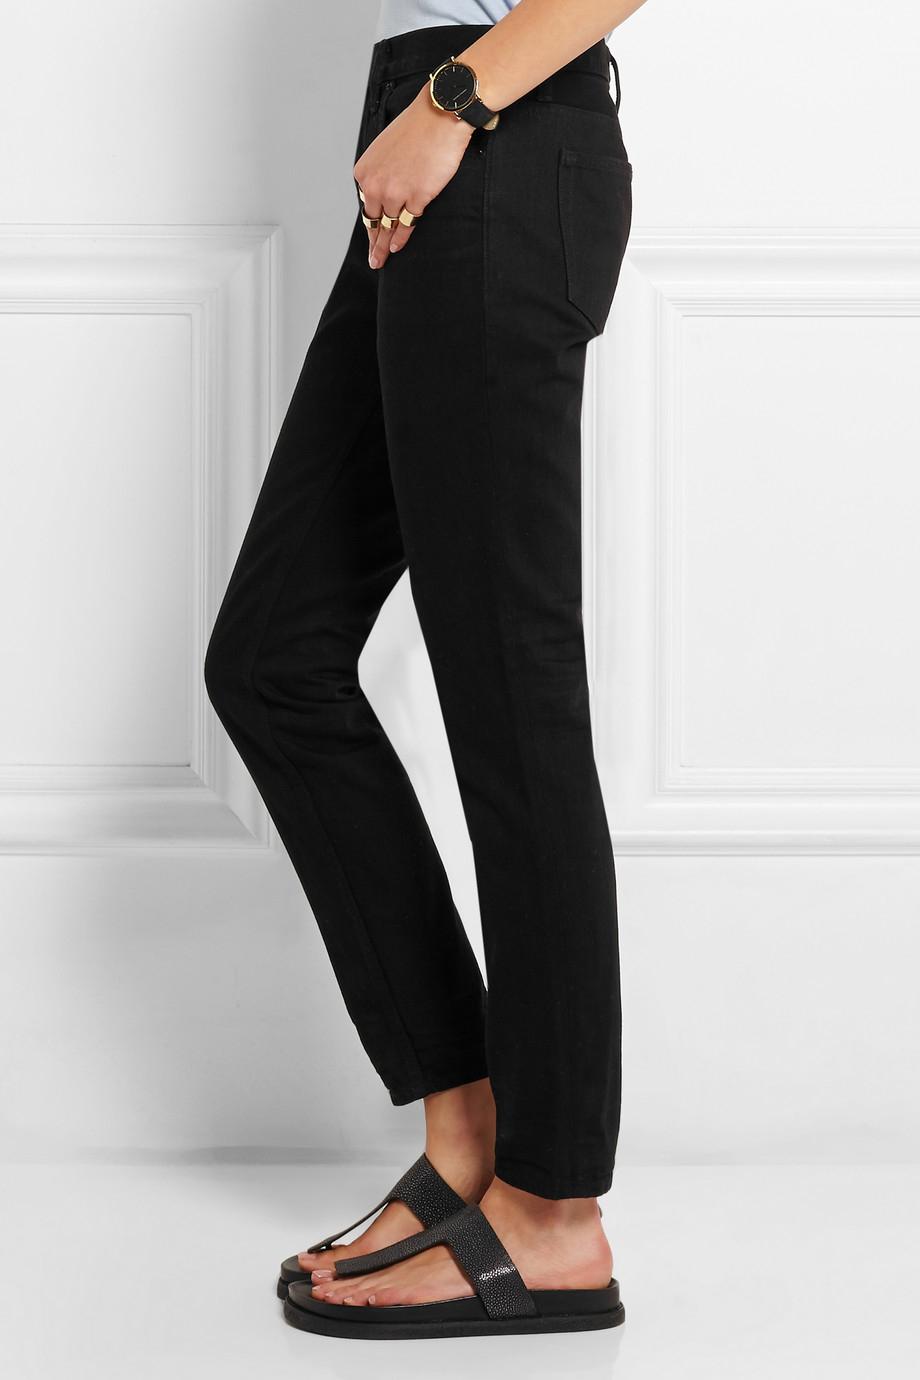 2aefcb7f5fa2 Lyst - Alexander Wang Wang 002 Straight-Leg Jeans in Black